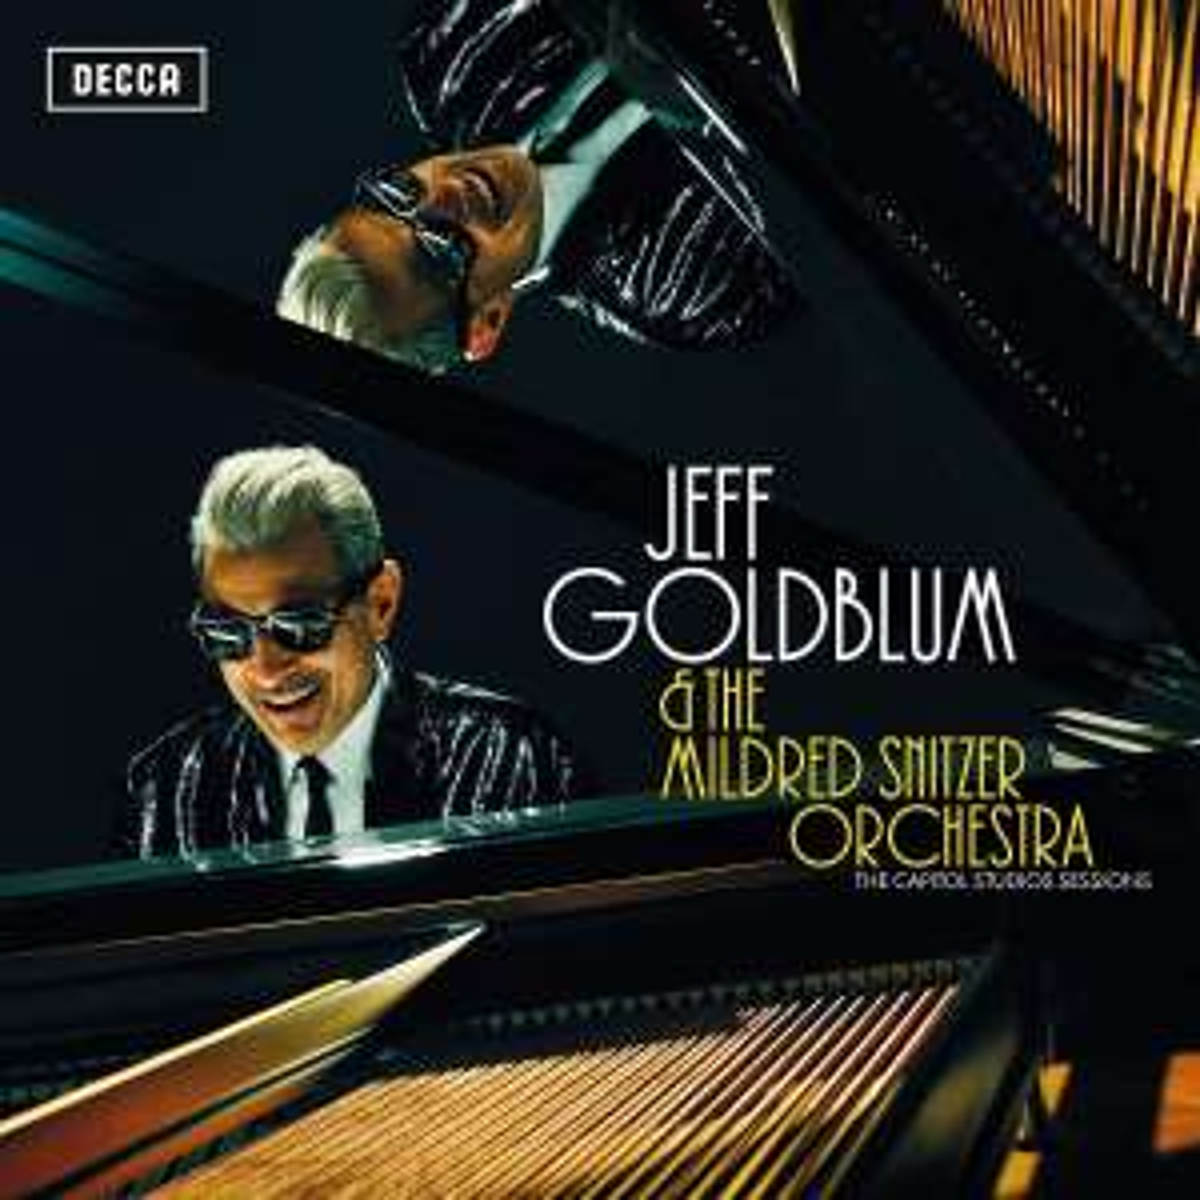 The Capitol Studios Sessions LP (vinyl) +mp3 download by Jeff Goldblum £12.99 @ Amazon Prime / £15.98 Non Prime